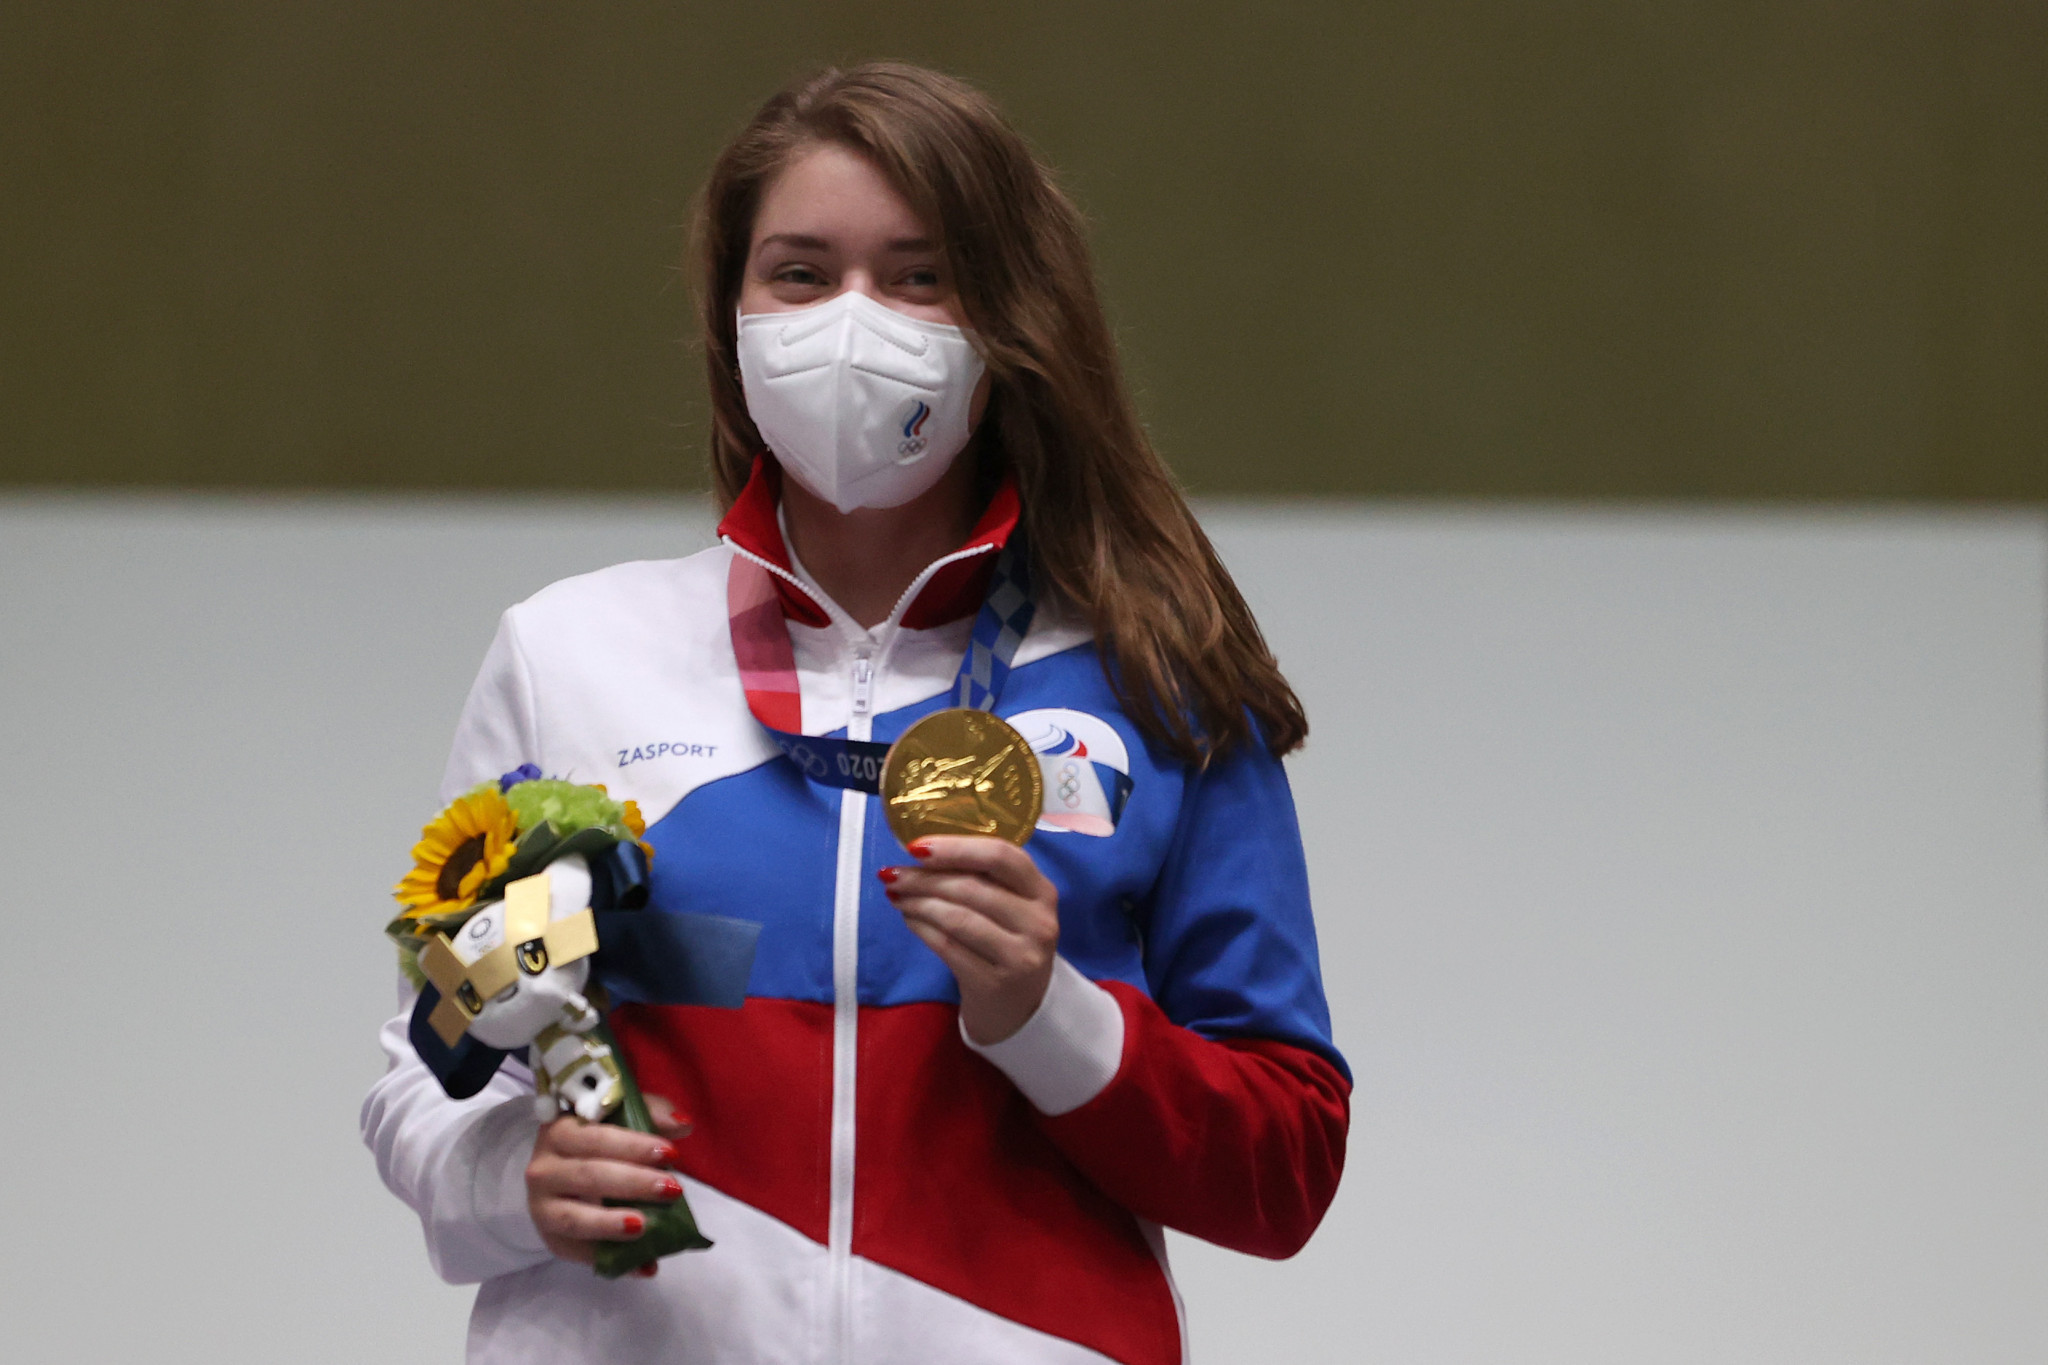 Batsarashkina's genes help provide platform for Olympic gold medal performance